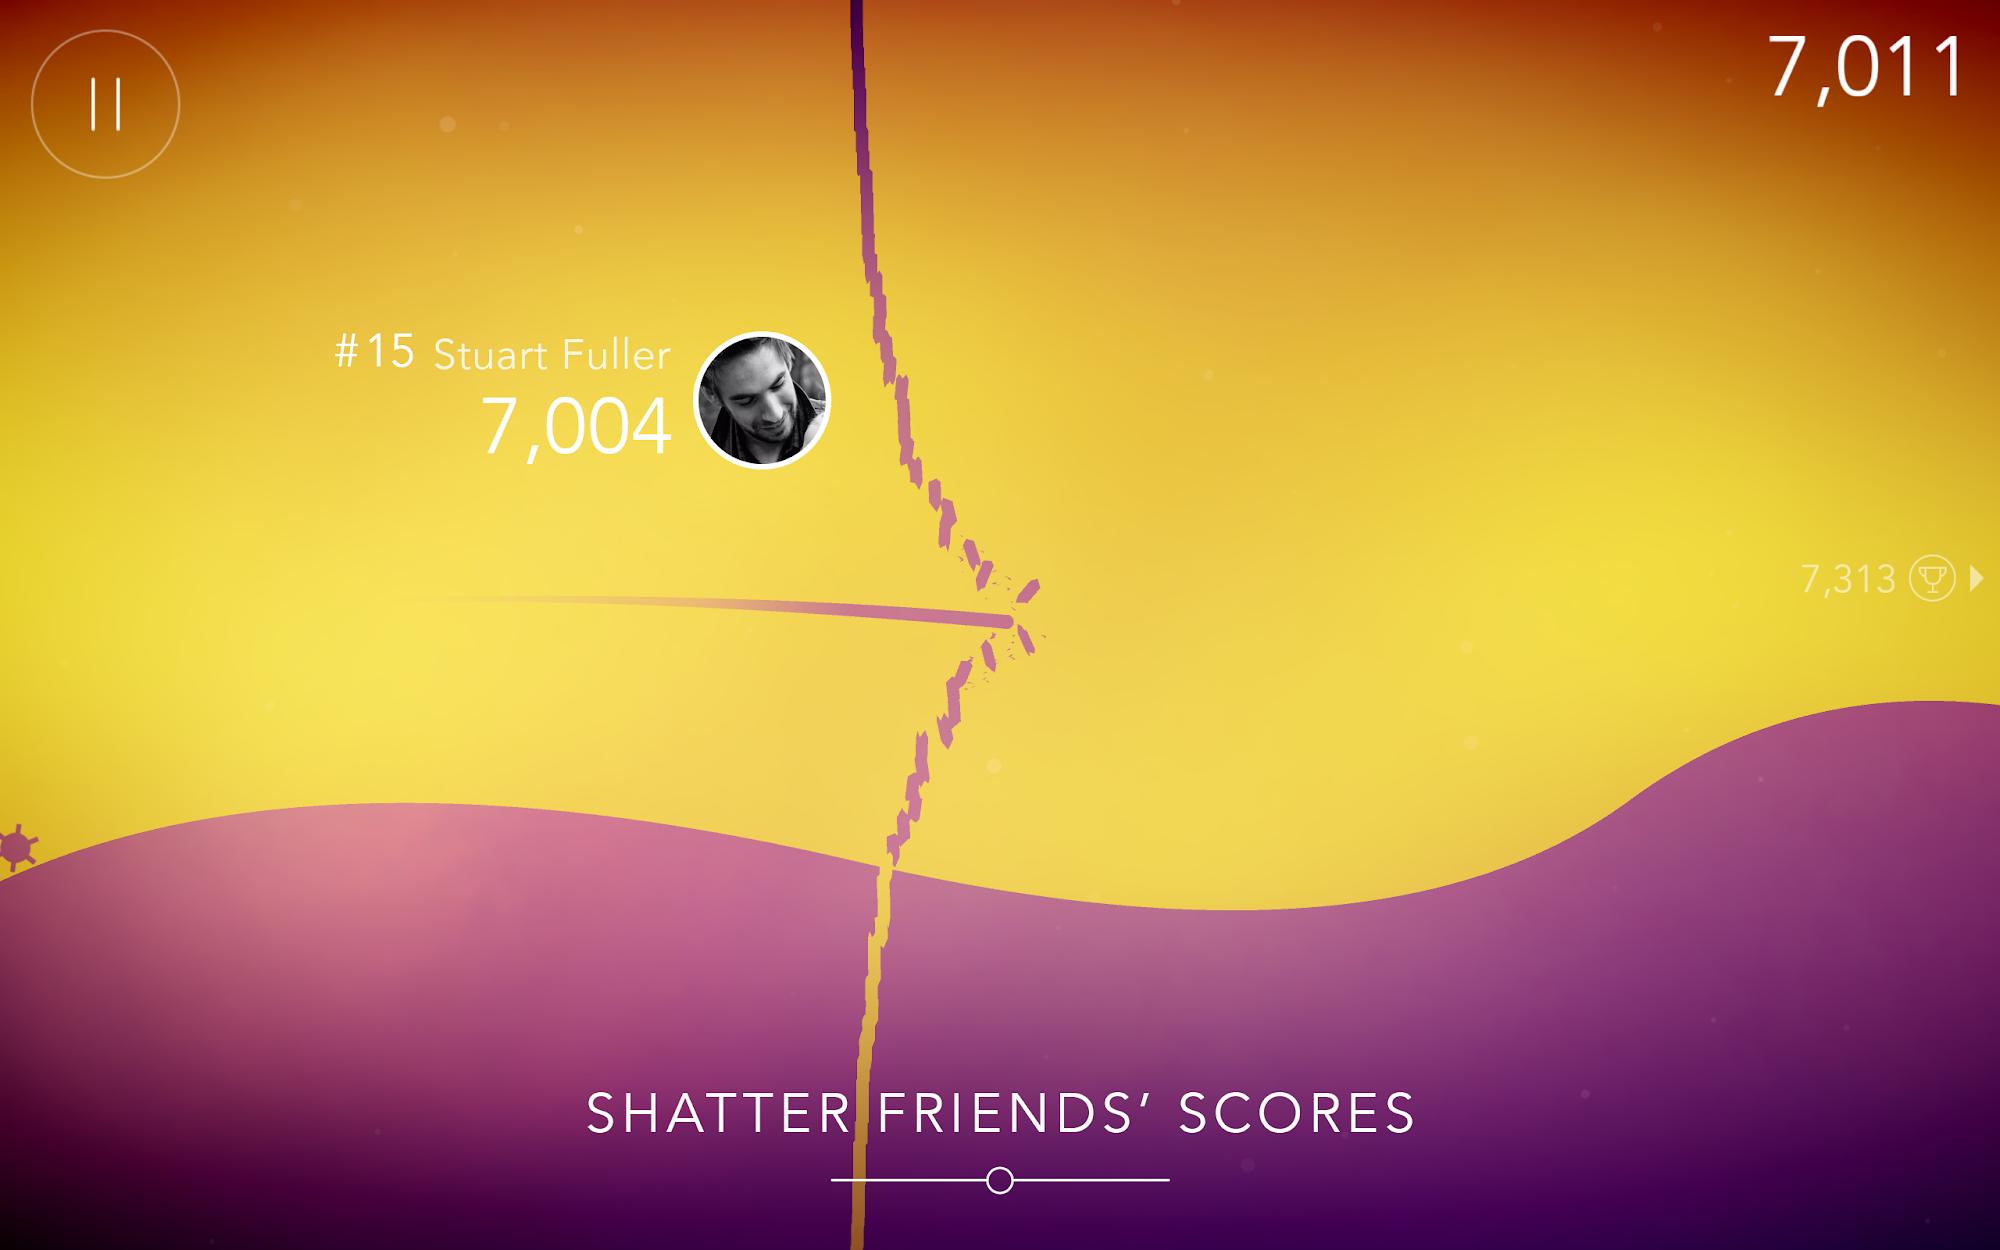 FLO Game - Free challenging infinite runner screenshot #11